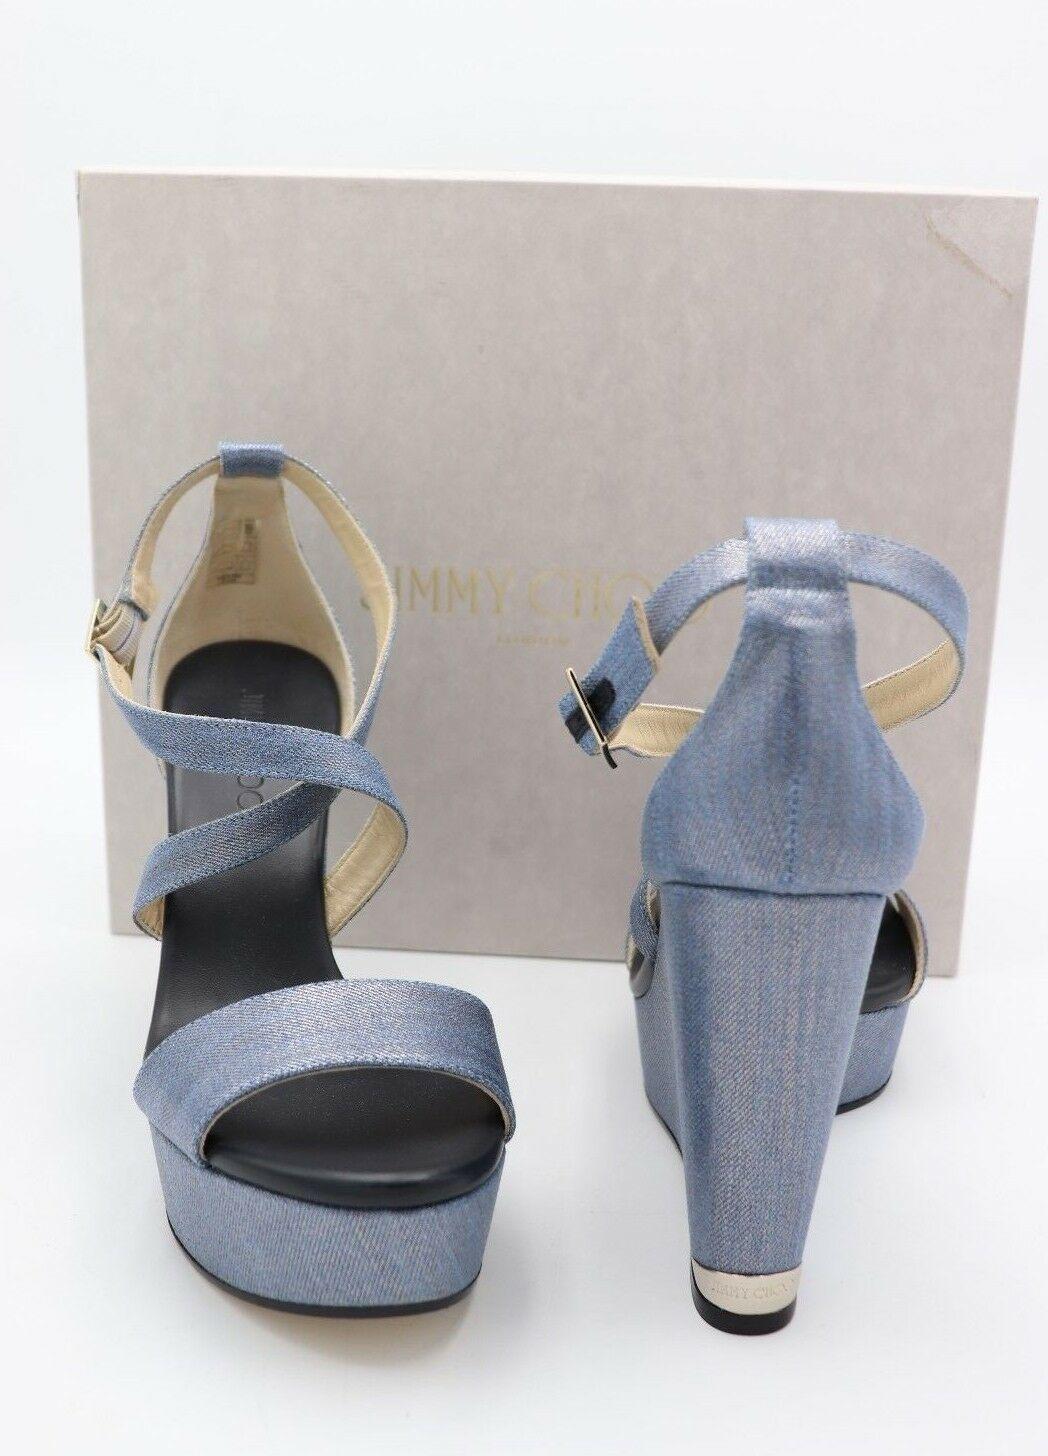 Nib Jimmy Choo Portia Métallique Bleu Denim Sandales Semelle Compensée 11 41 New